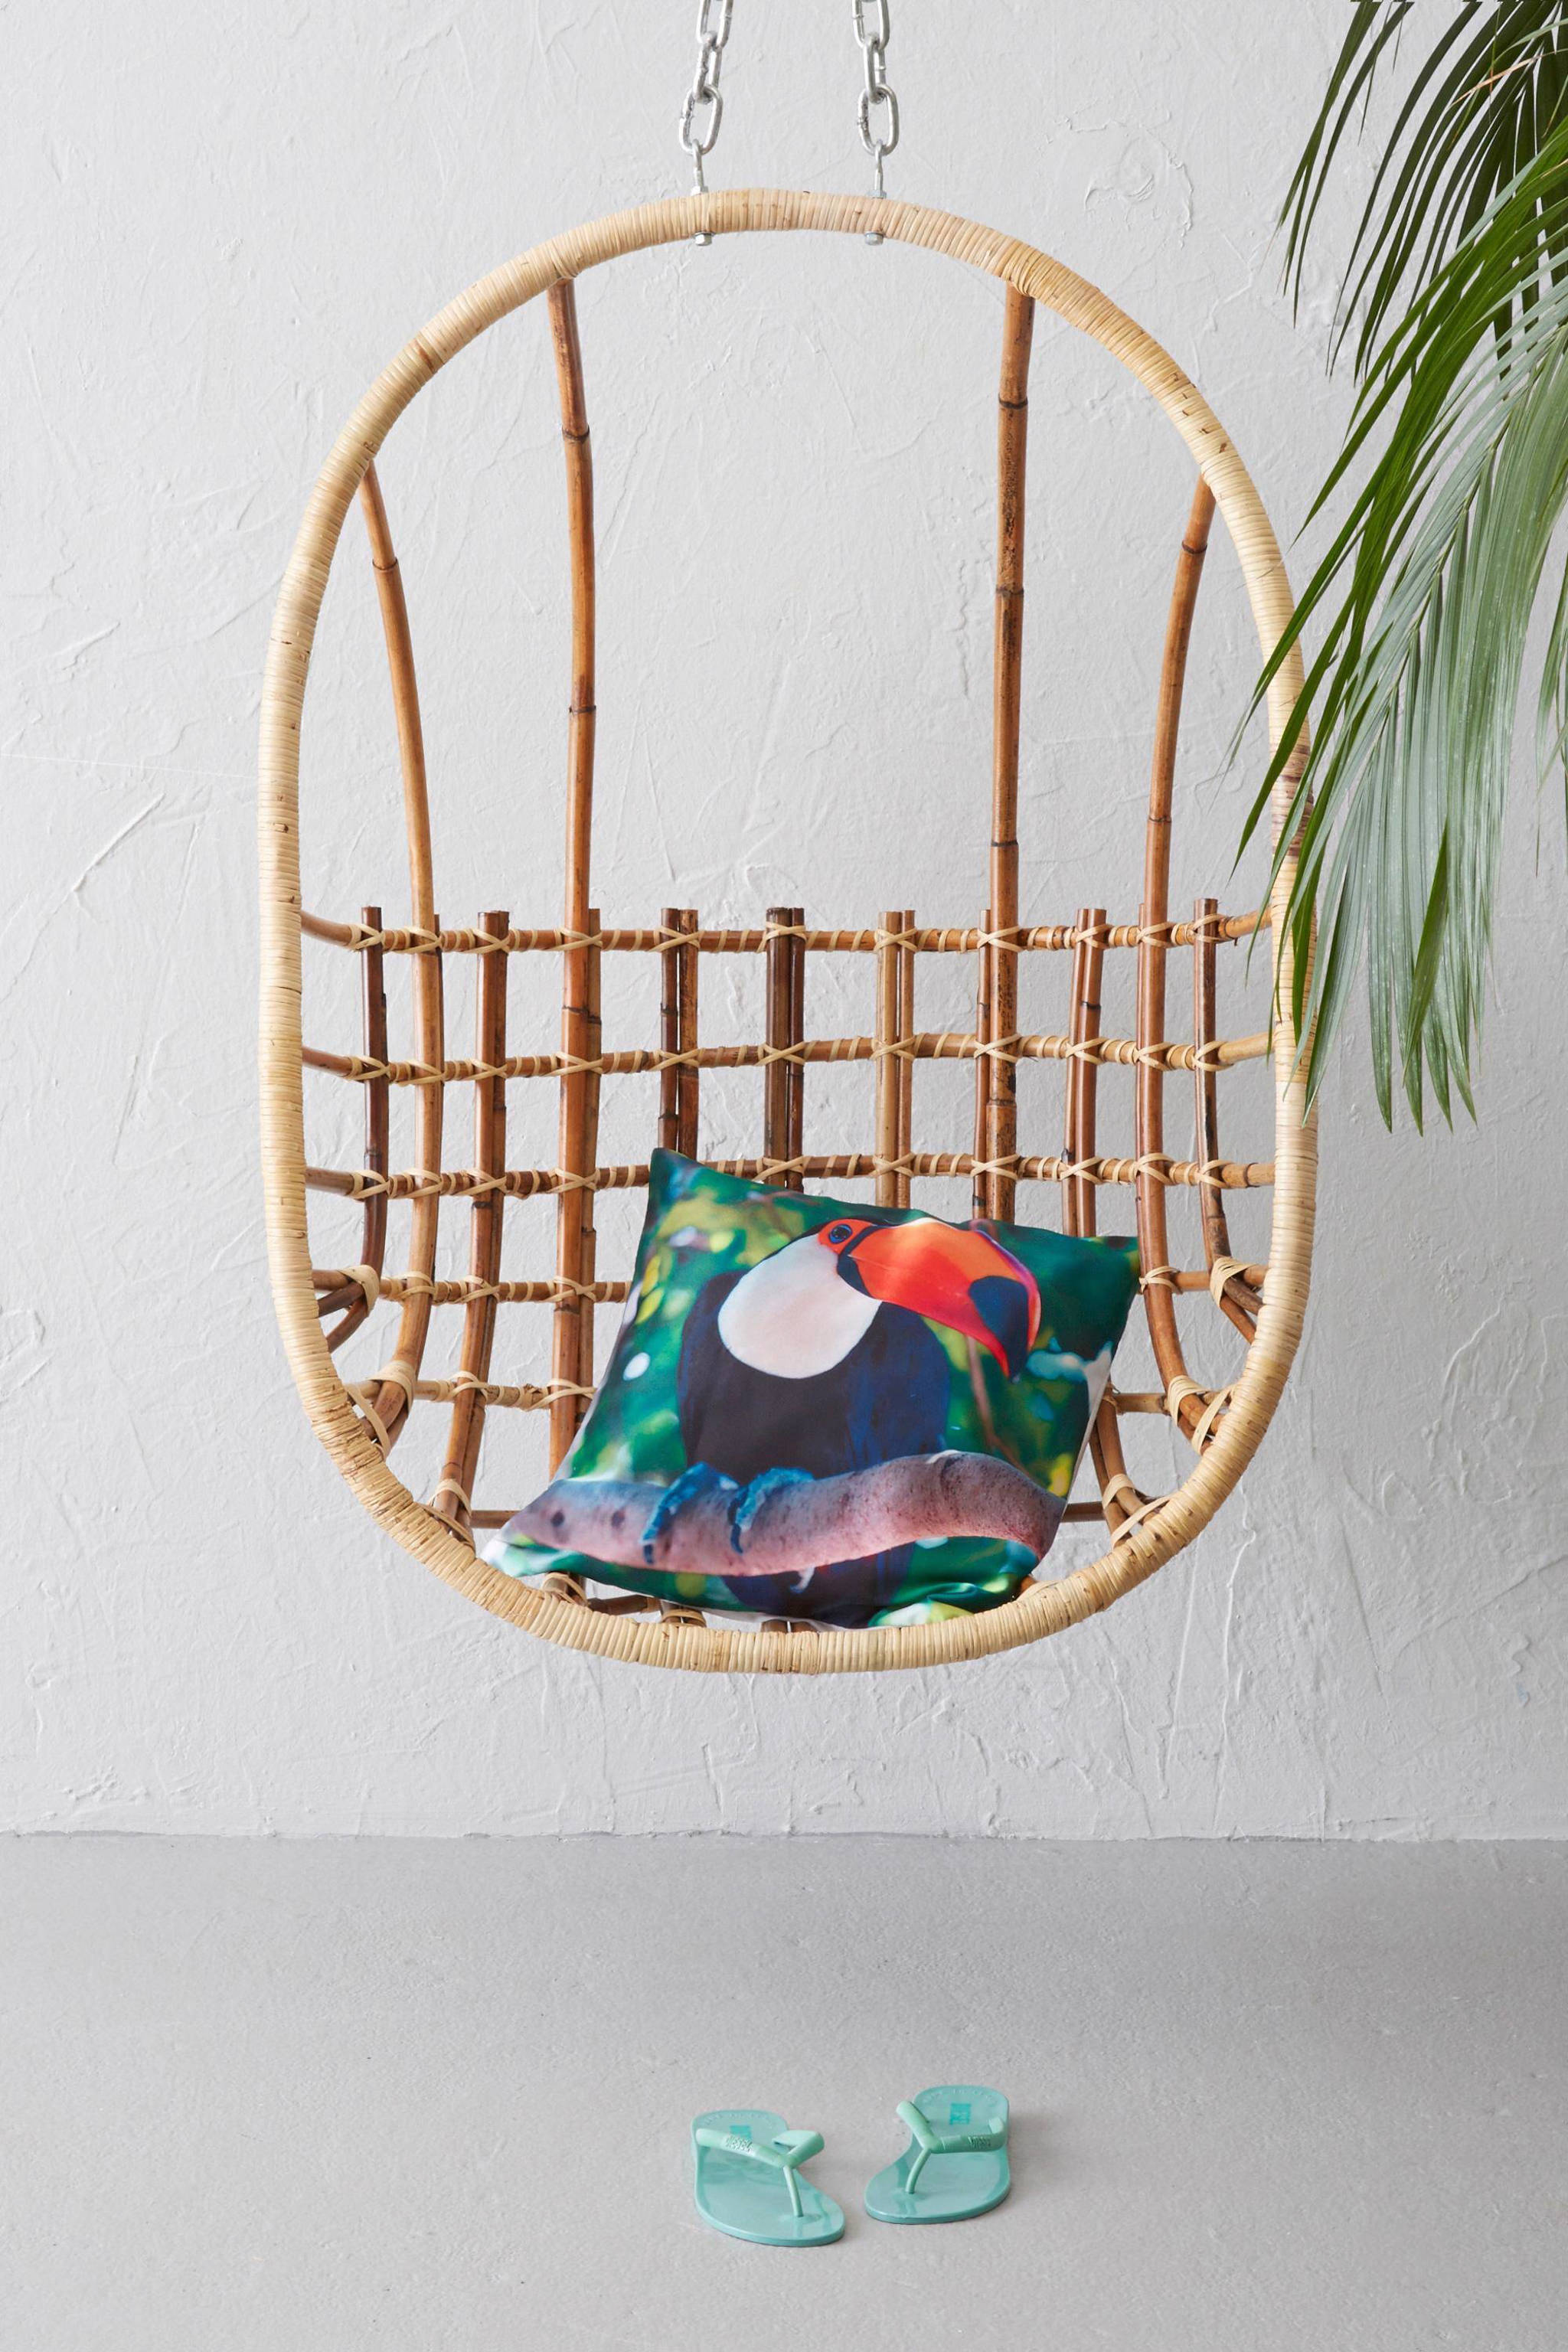 Rotan Hangstoel Wehkamp.Sissy Boy Egg Chair Wehkamp